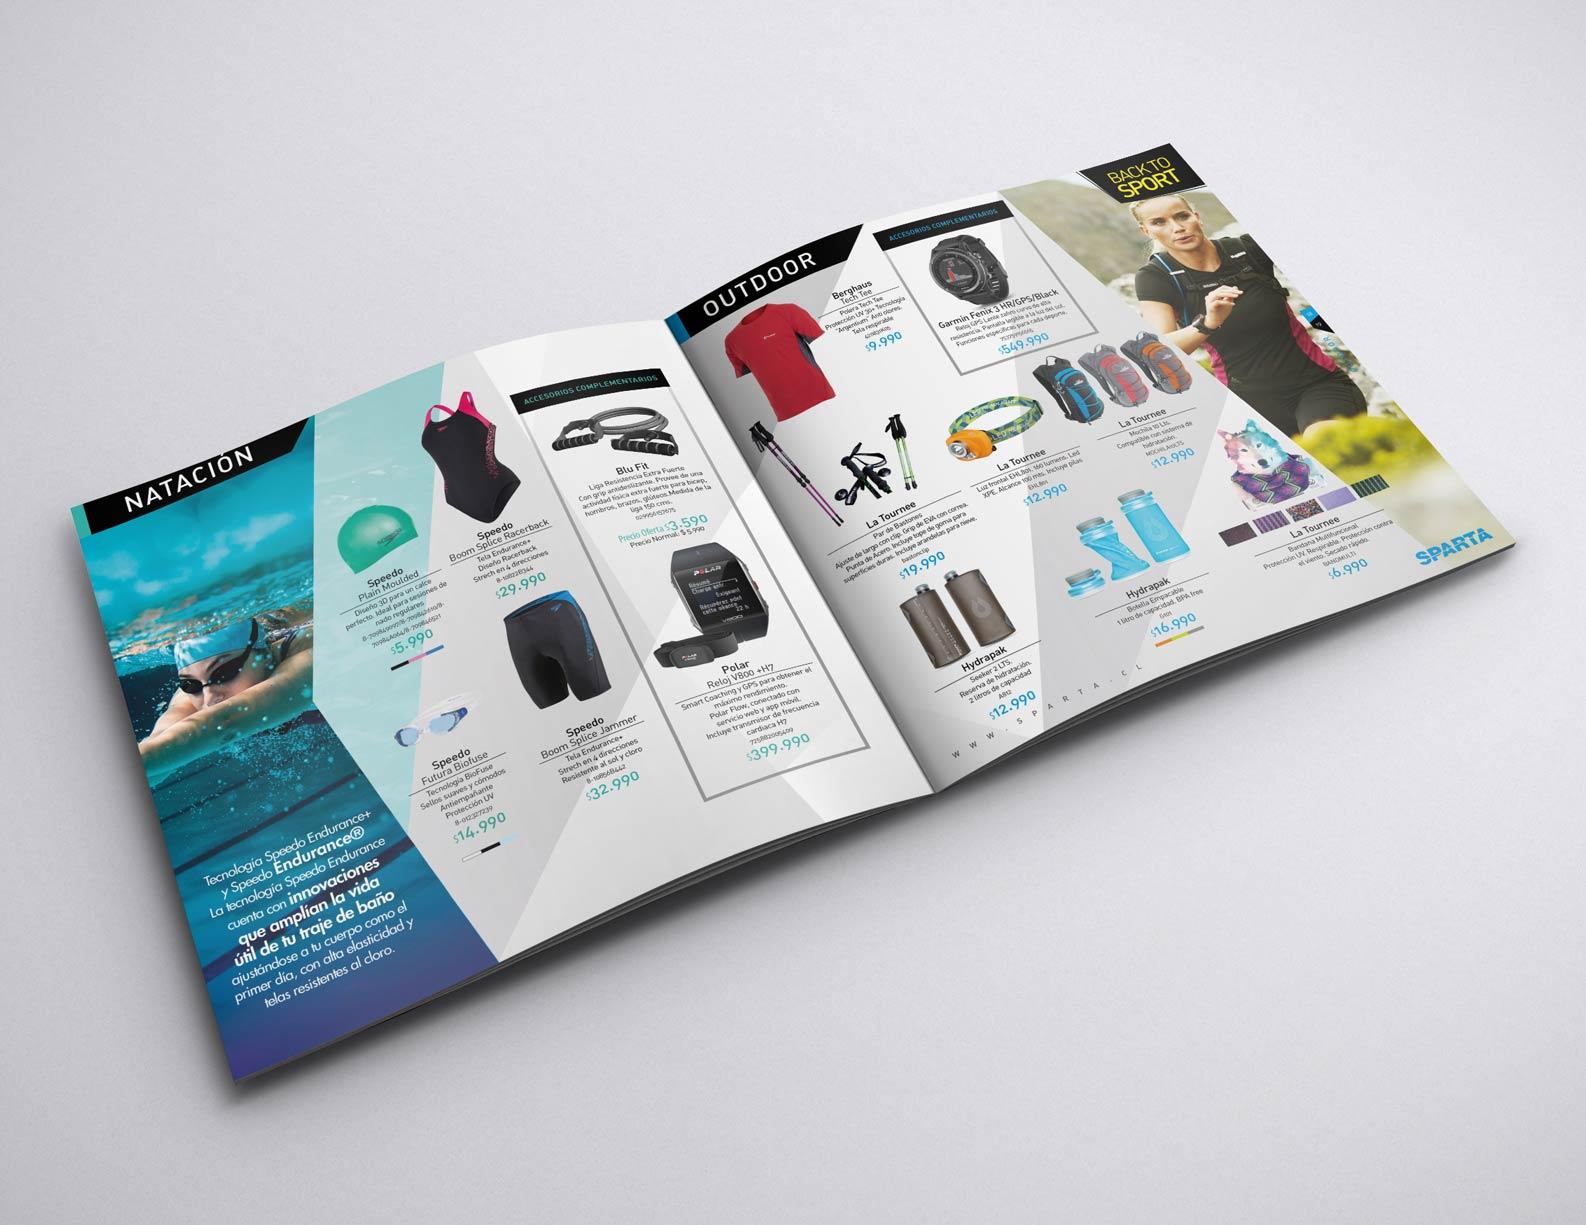 03-Mockup_Brochure_21x21_5